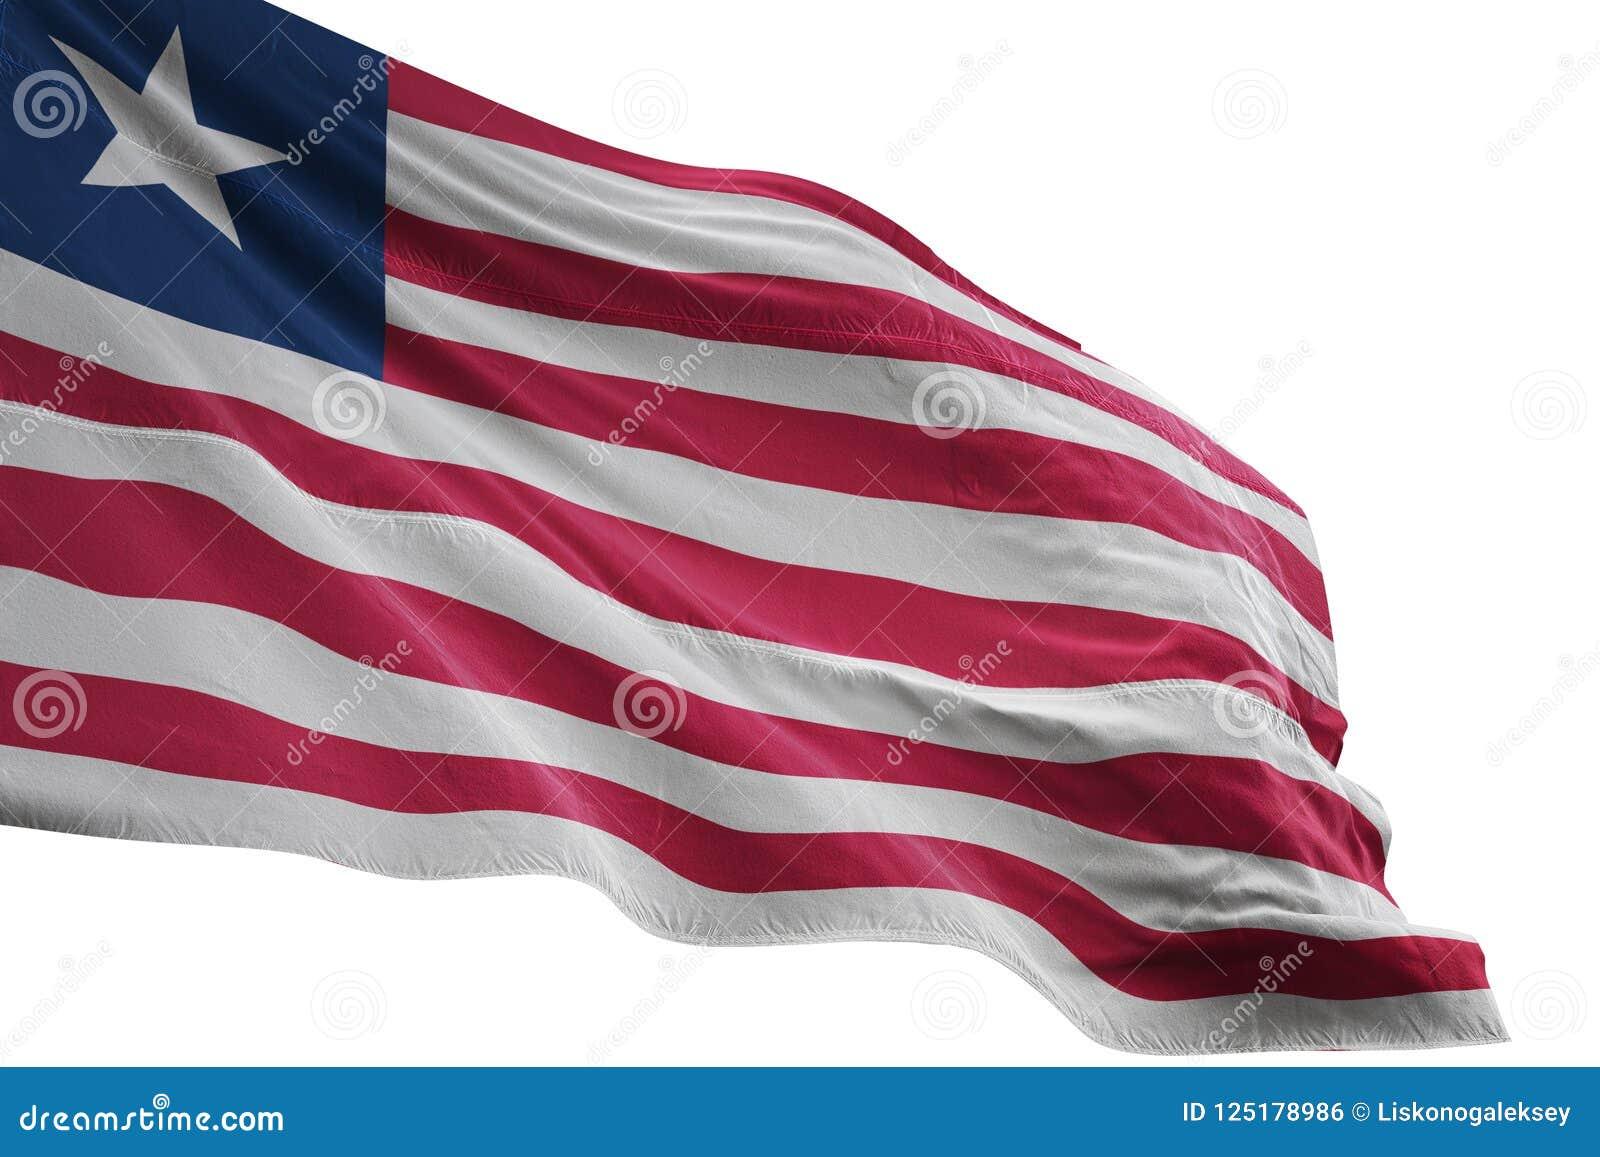 Liberia National Flag Waving Isolated On White Background 3d